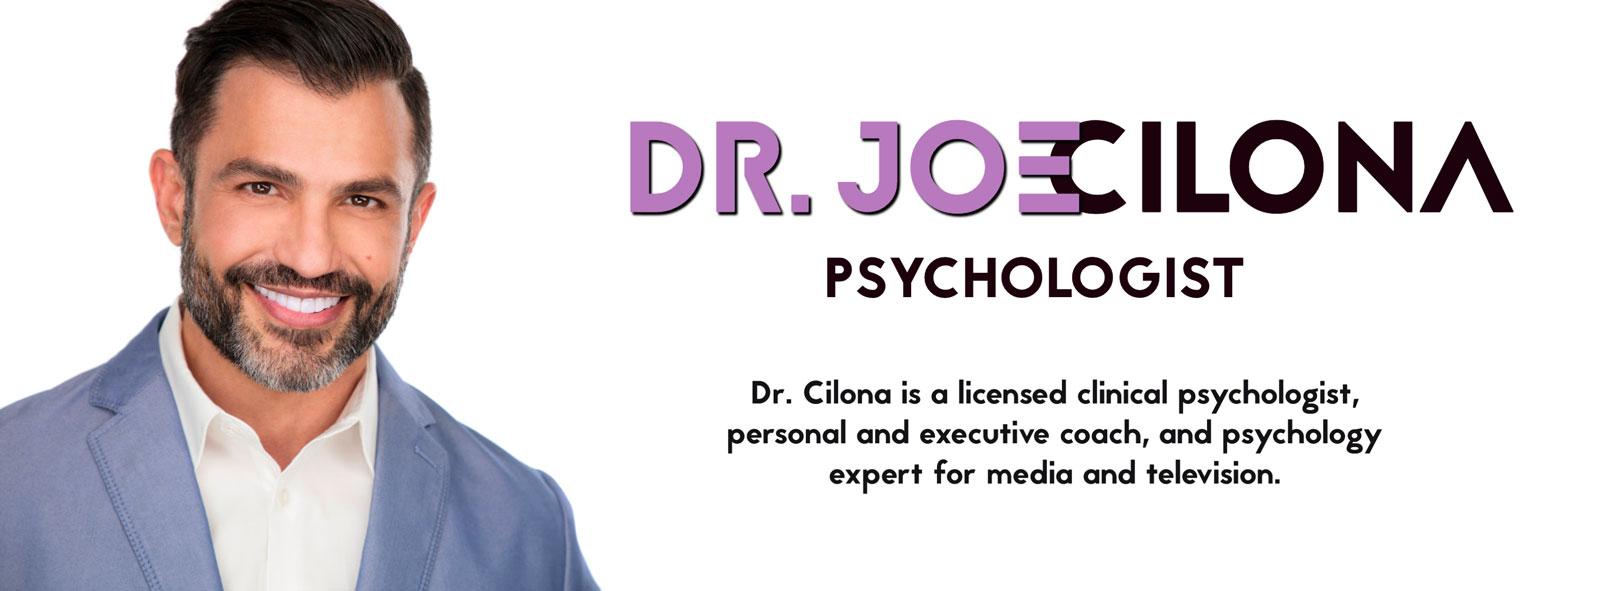 dr-joseph-cilona-psychologist-coach-psychology-expert